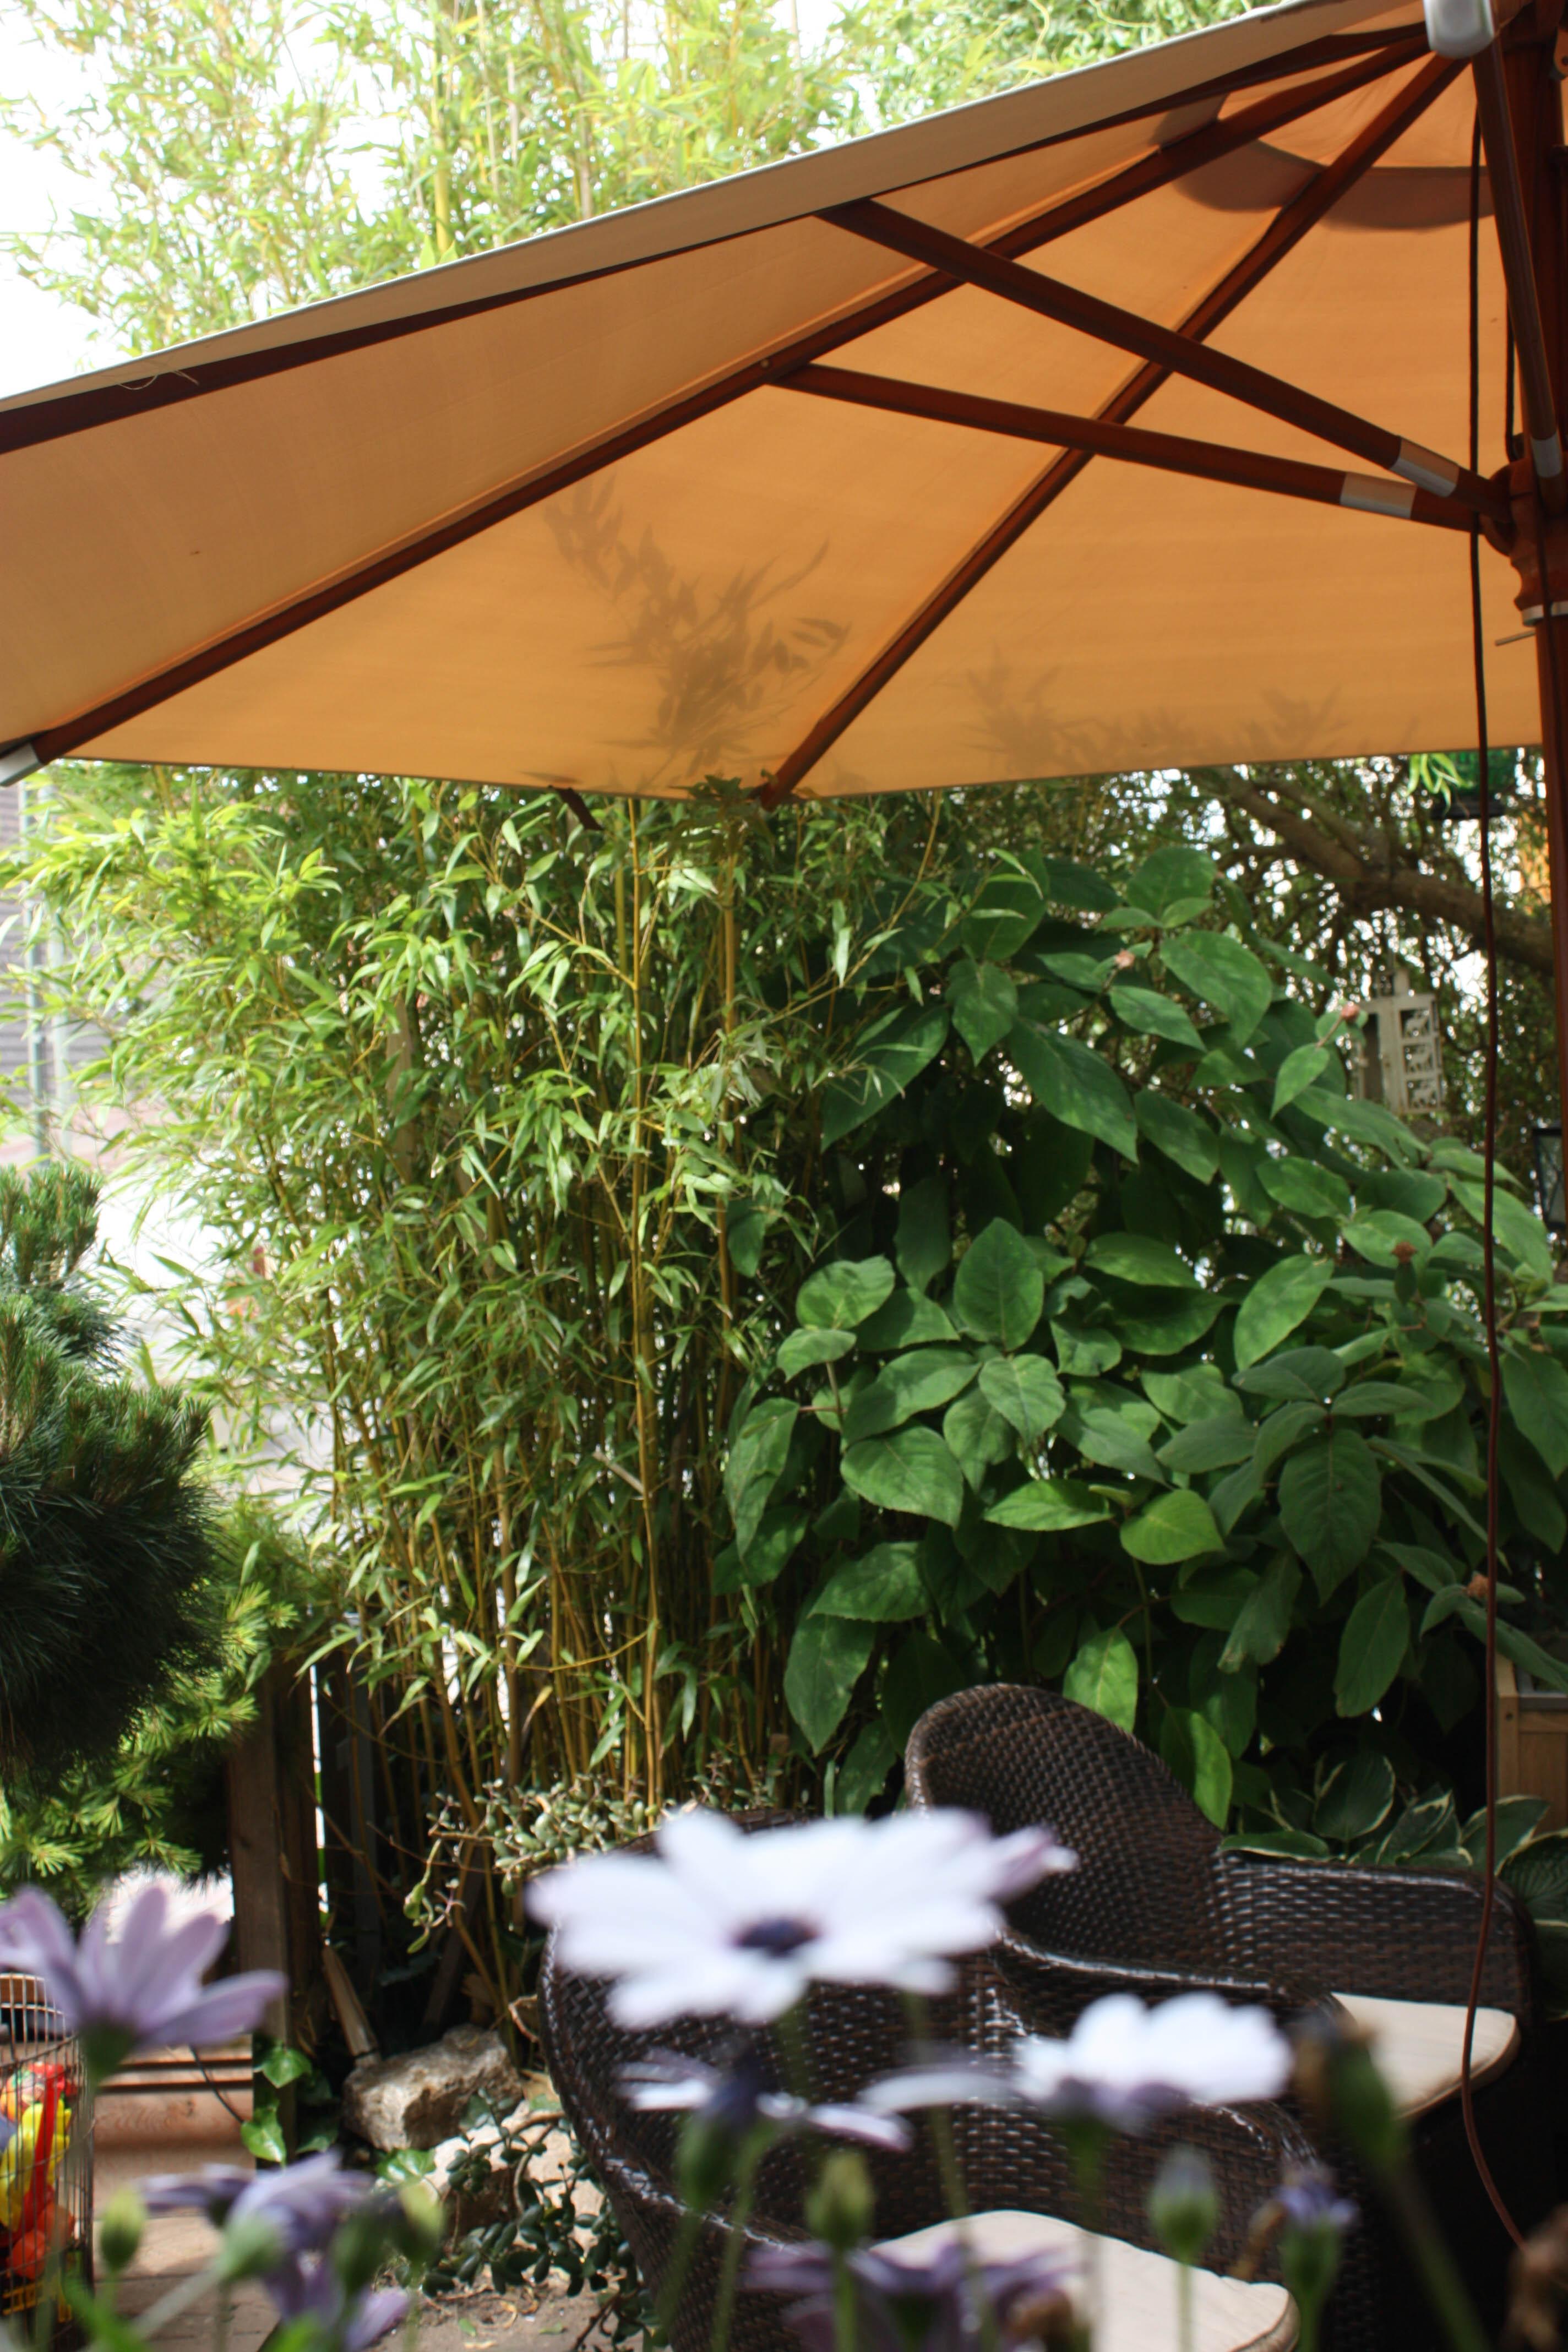 moderne pflanzk bel f r balkon terrasse und garten native plants gartenblog. Black Bedroom Furniture Sets. Home Design Ideas